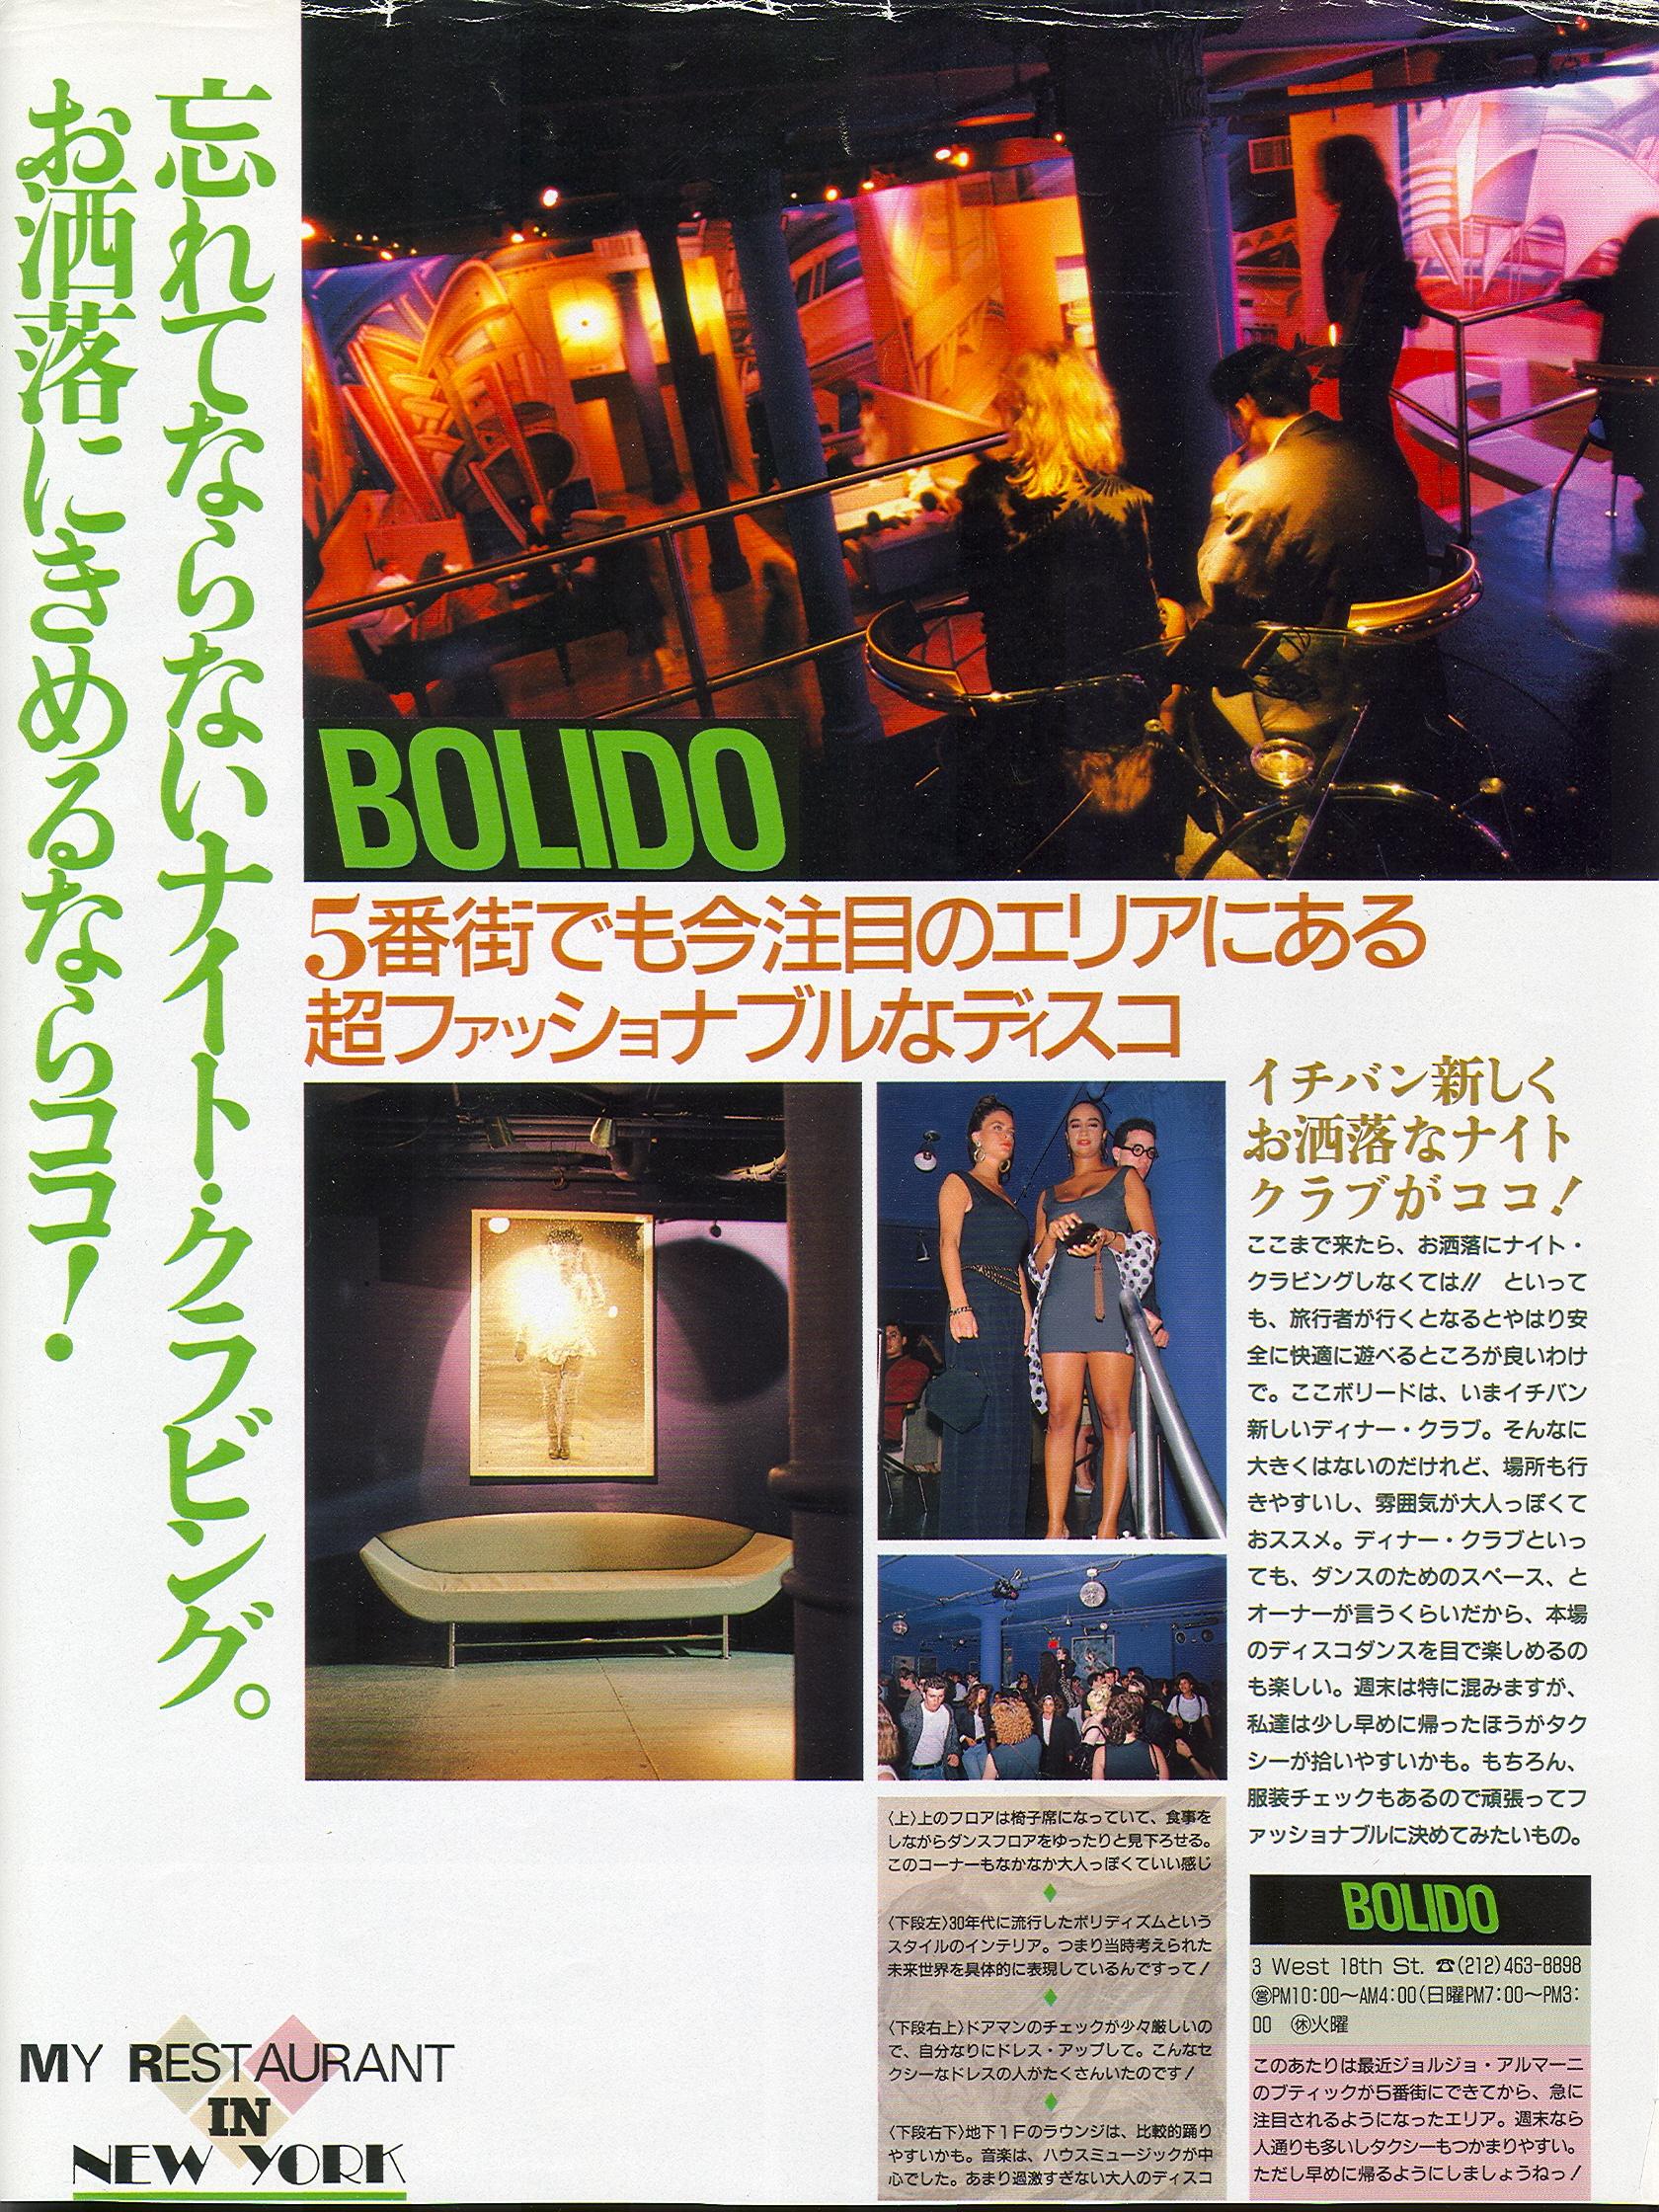 Bolido Night Club 002.jpg